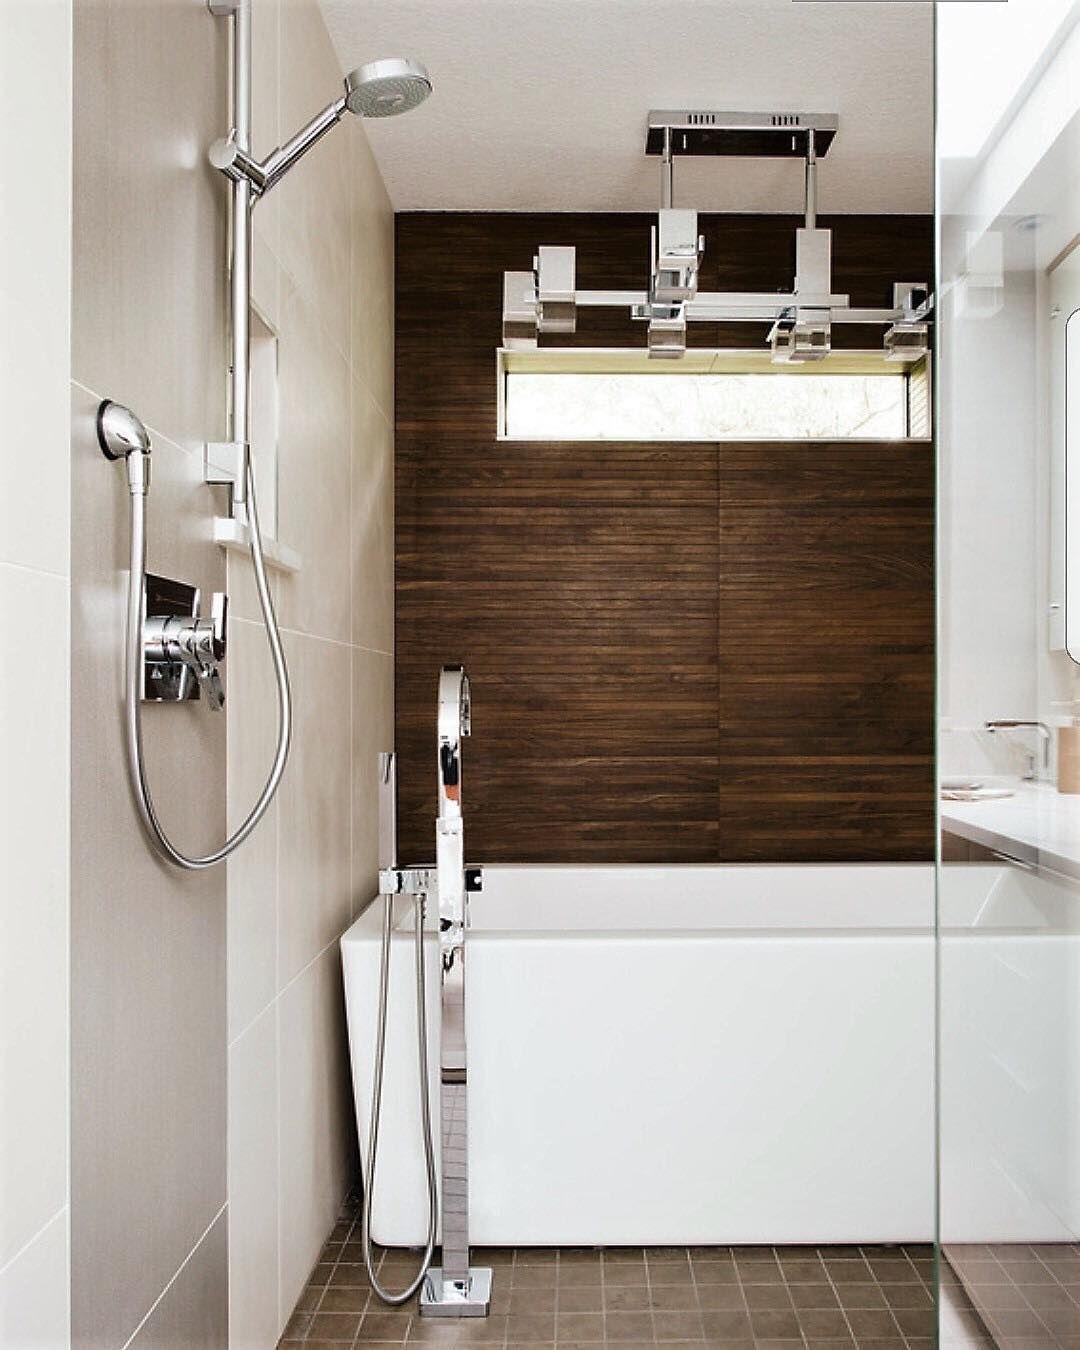 amber pirillo showroom associate at fergusonshowrooms designed this rh pinterest com